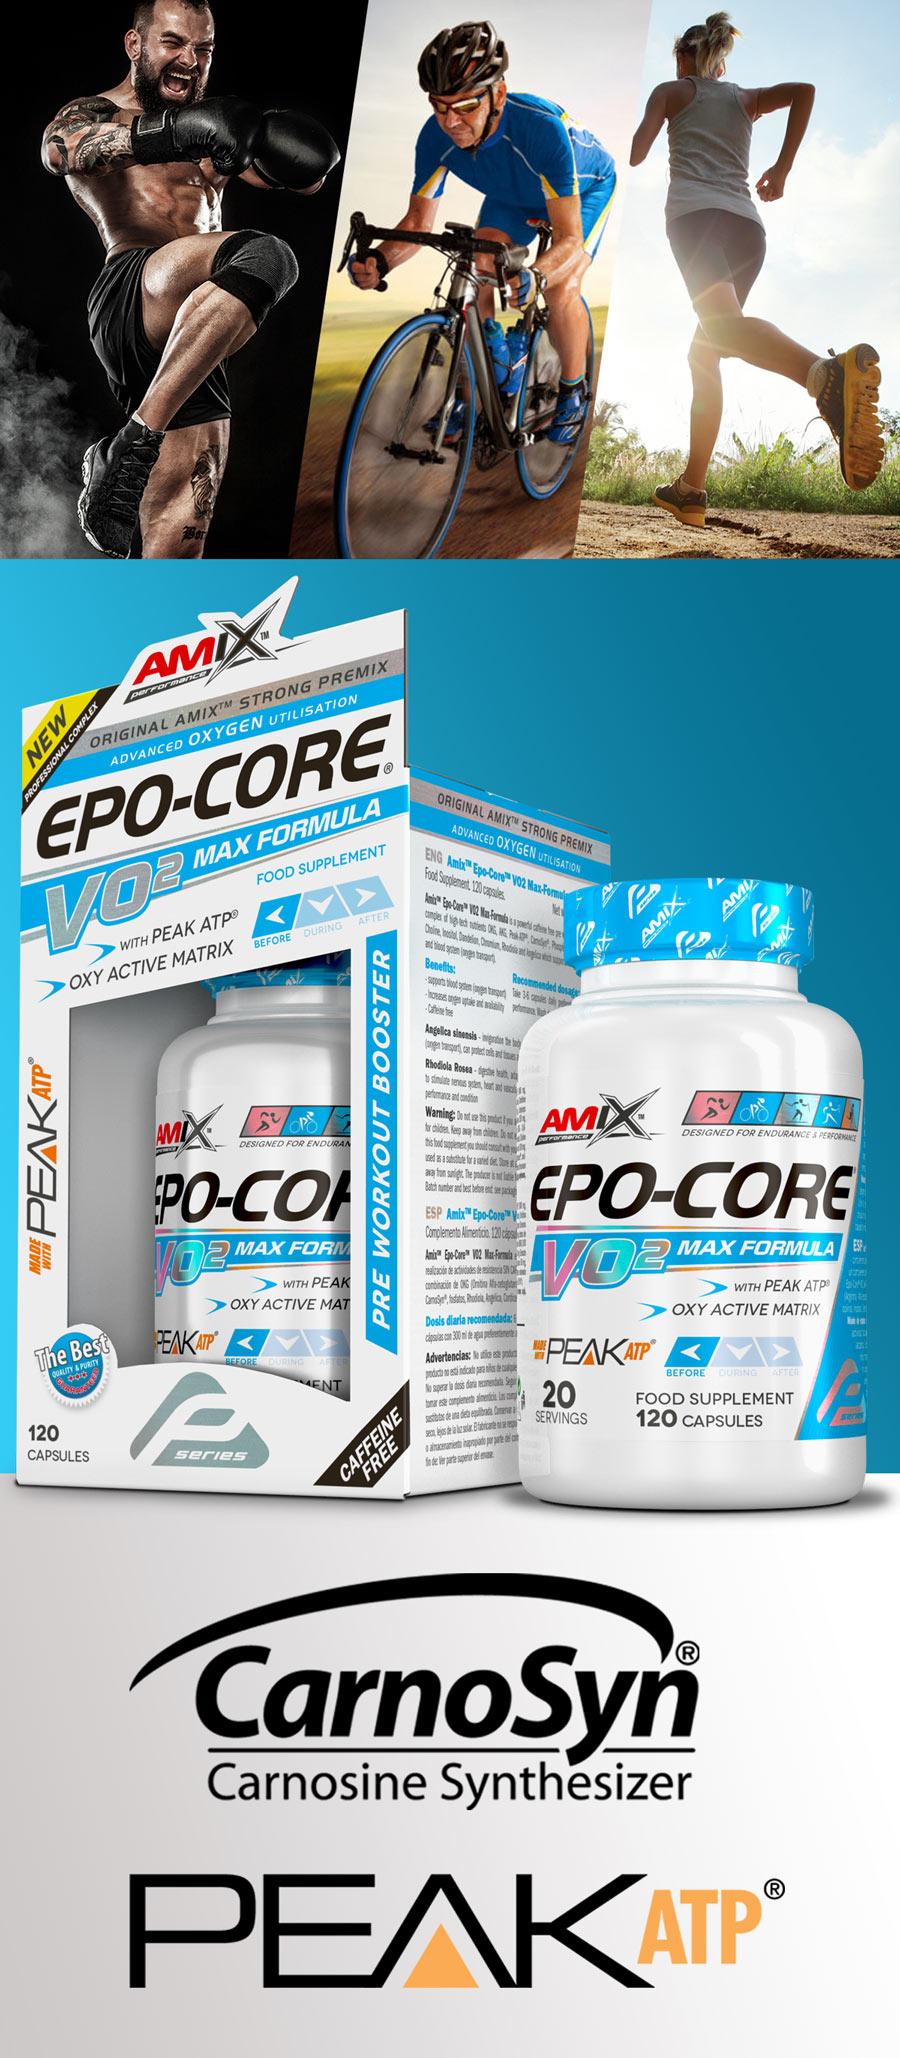 amix-perfomance-epo-core